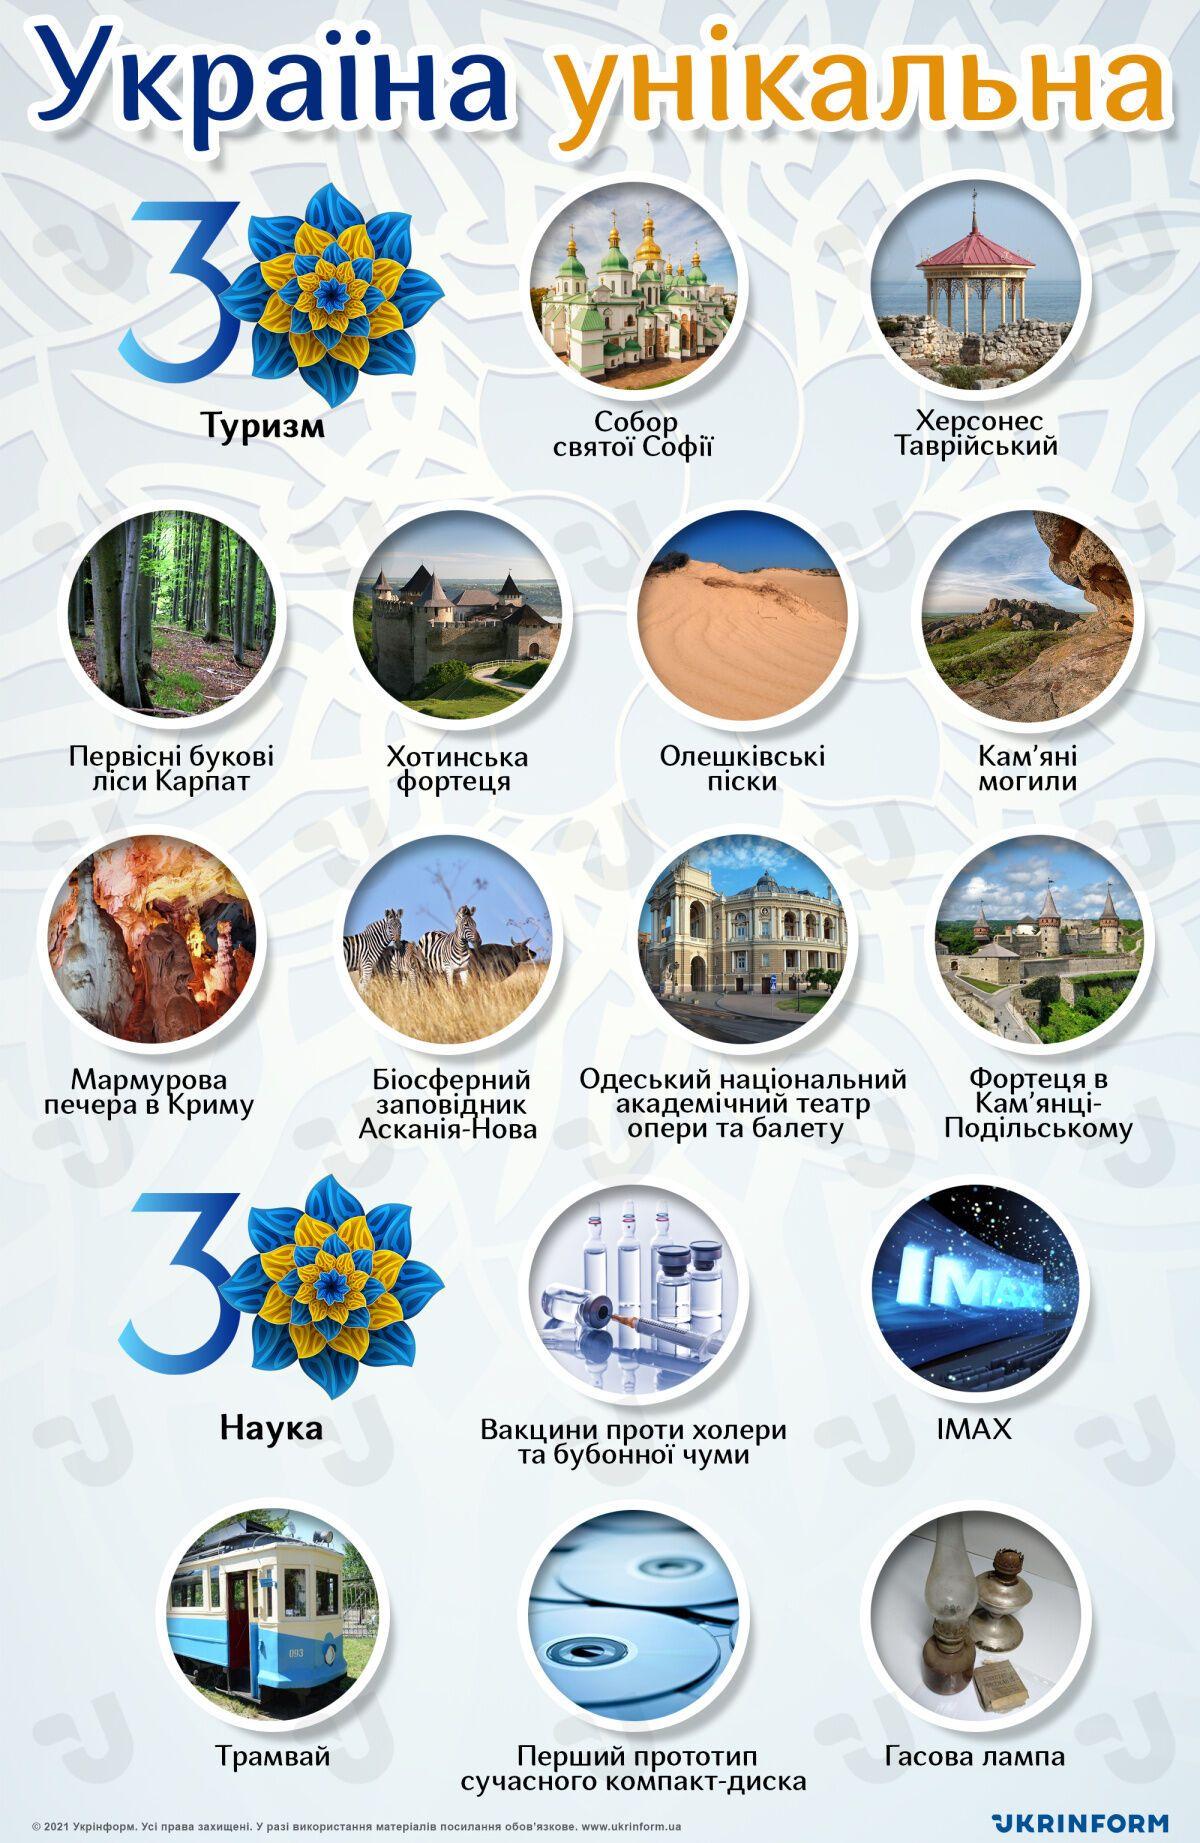 Україна унікальна, незалежності - 30 років